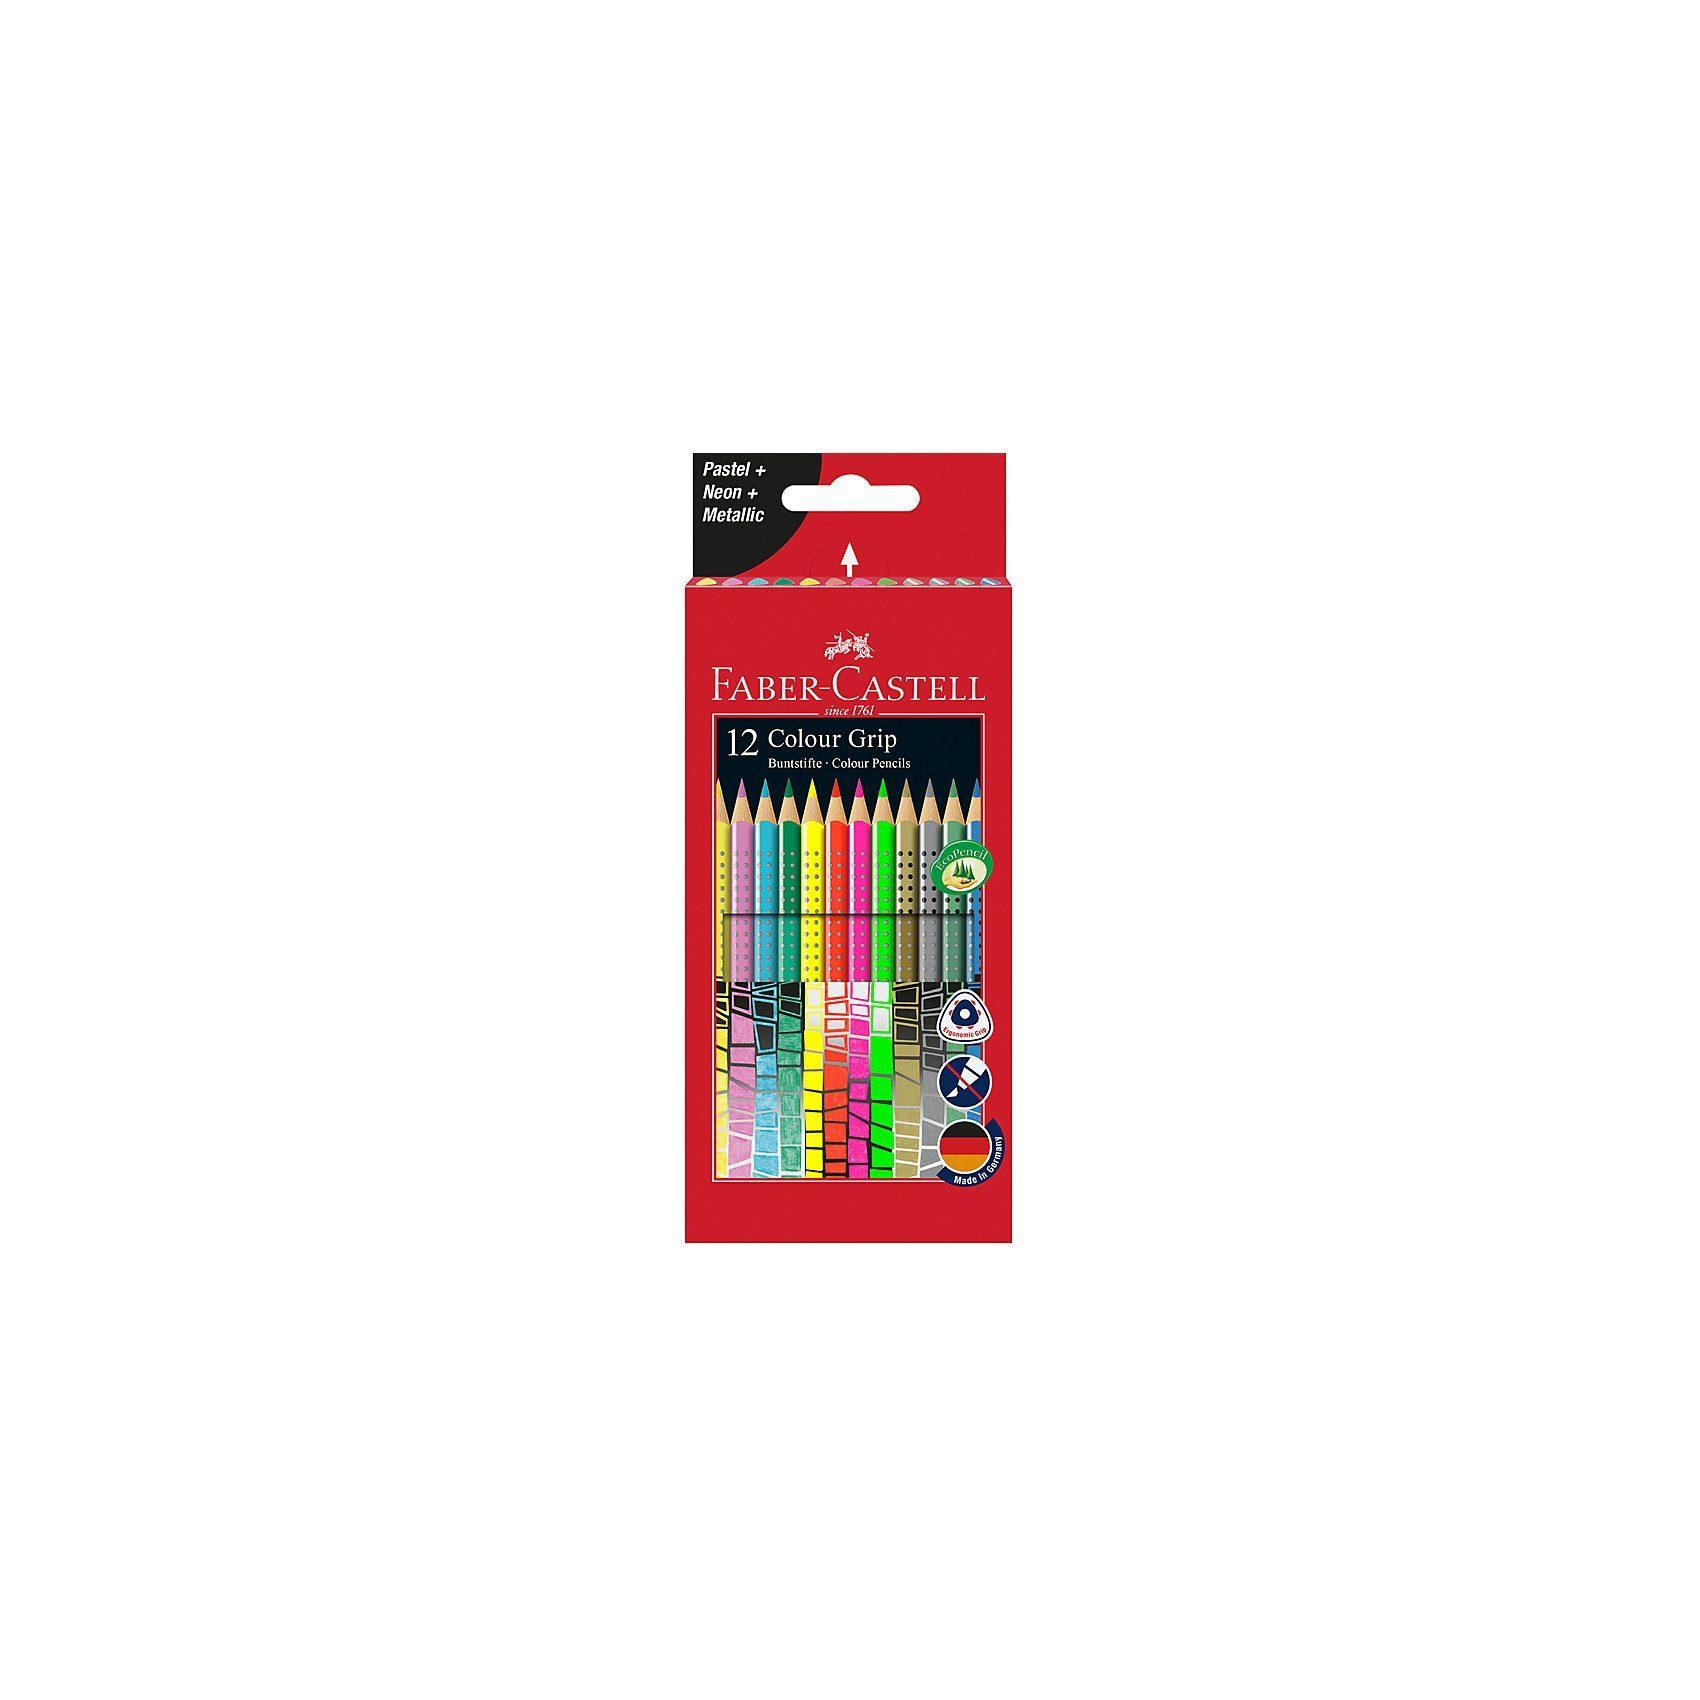 Faber-Castell Colour Grip Sonderfarbset, 12 Farben